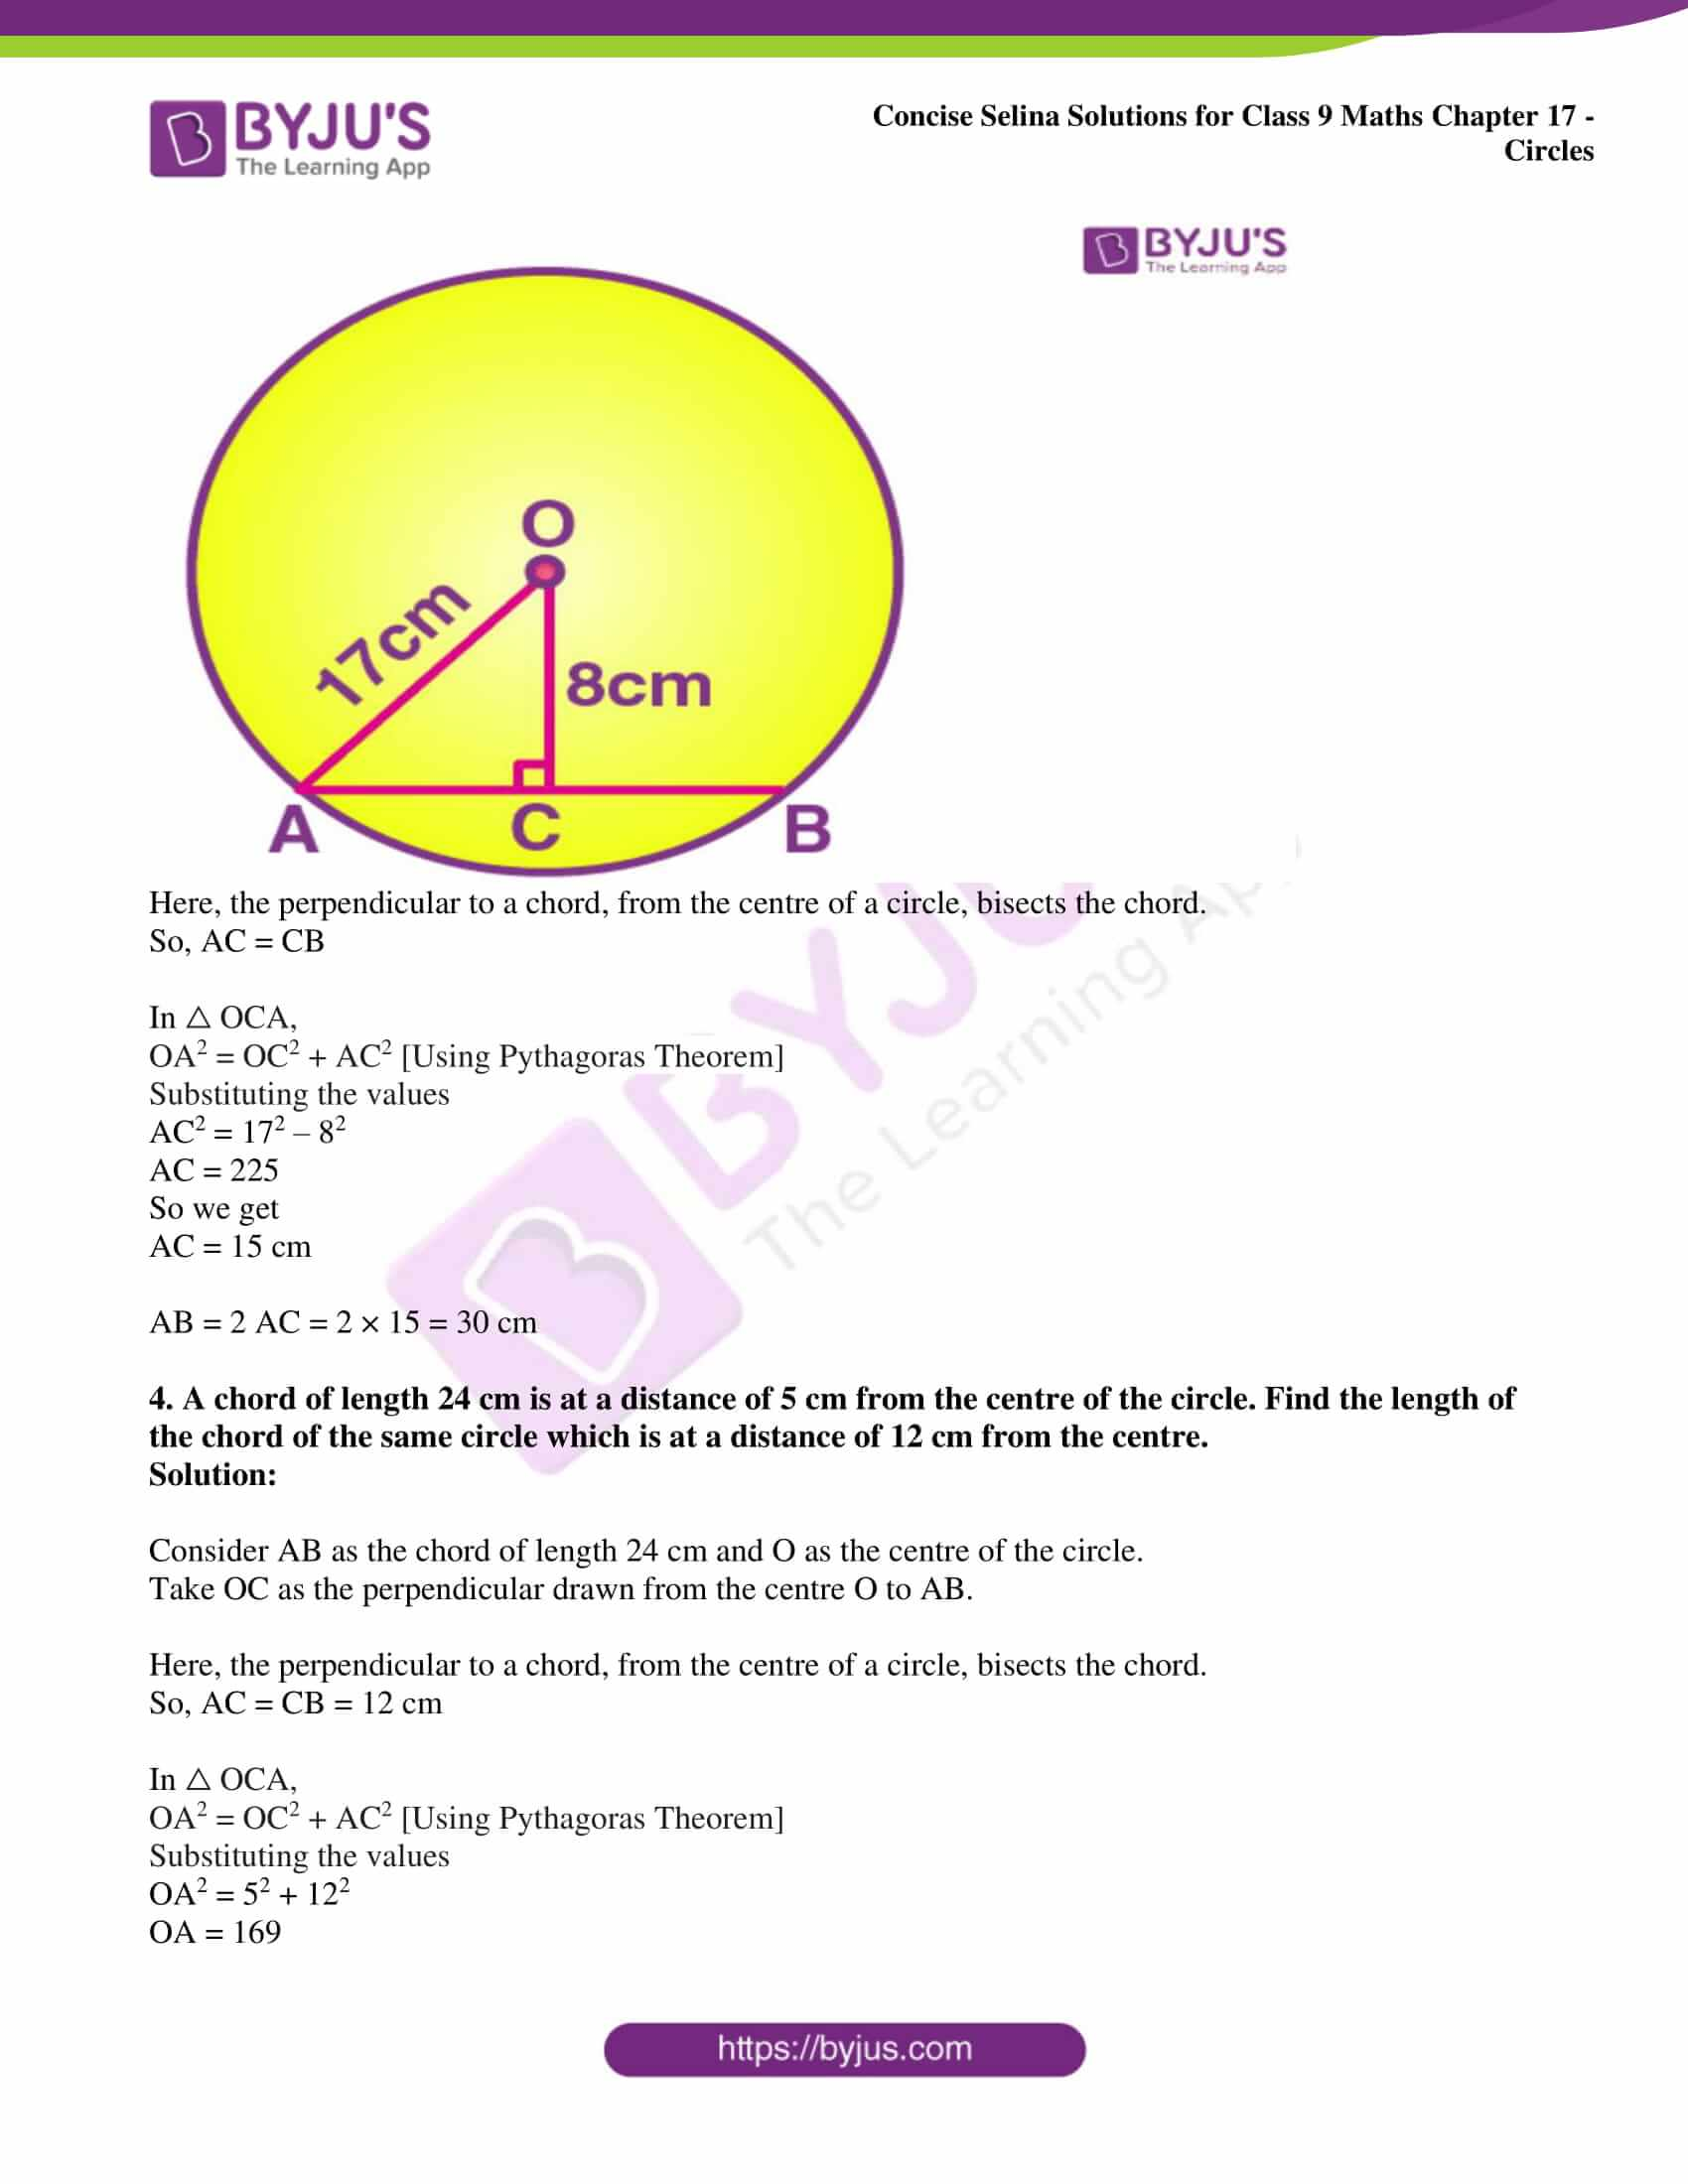 icse class 9 maths may10 selina solutions chapter 17 circles 03